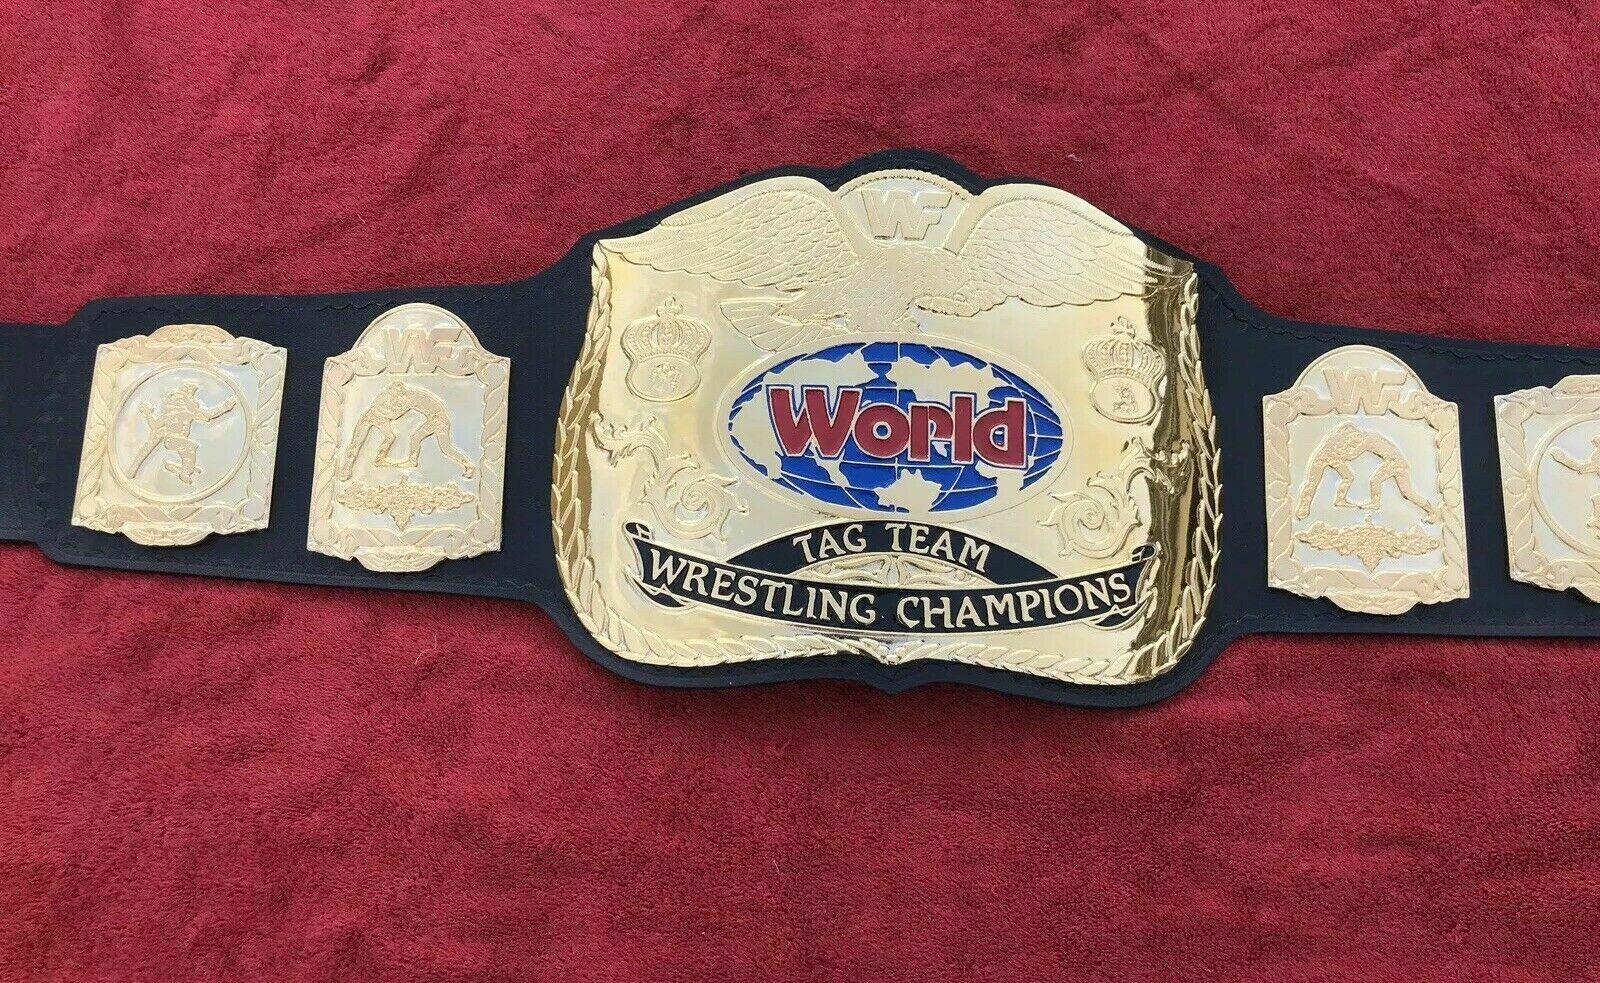 WWF World Tag Team Wrestling Championship Belt - $325